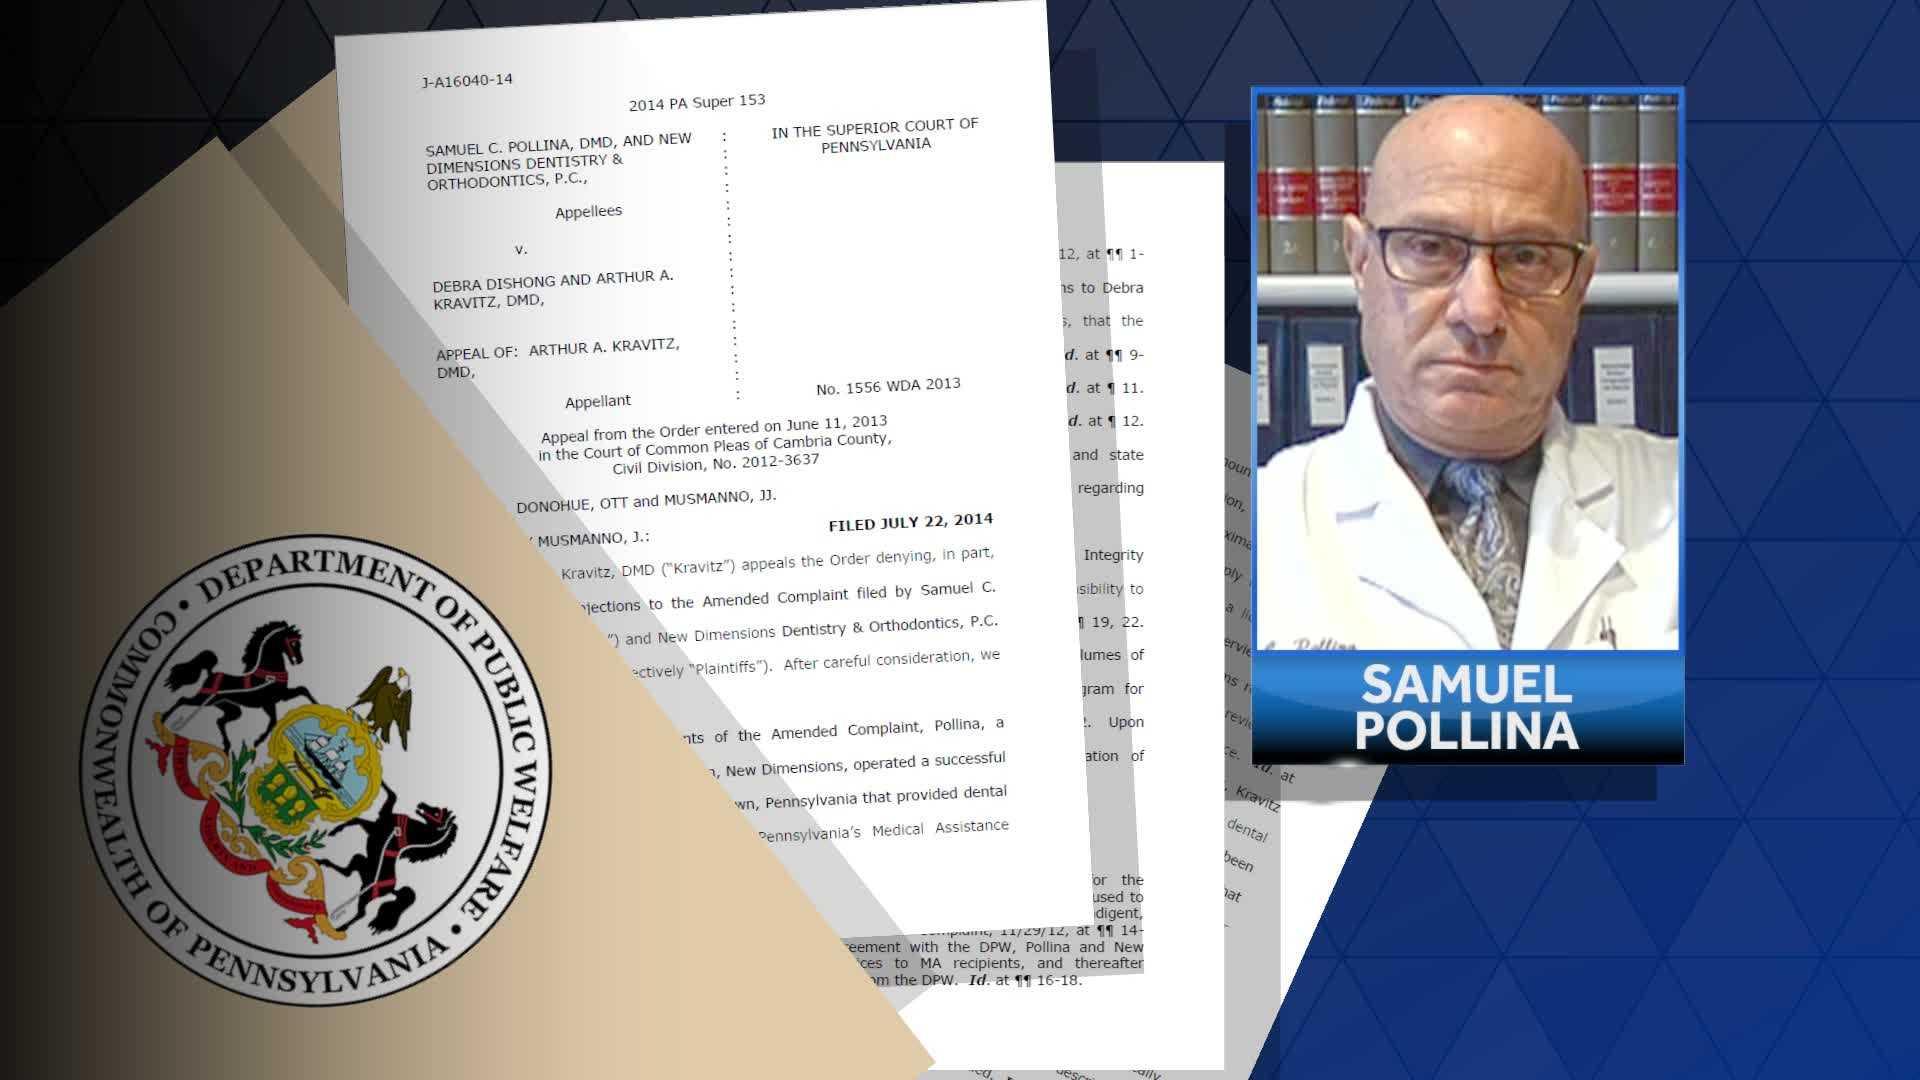 Dr. Samuel Pollina